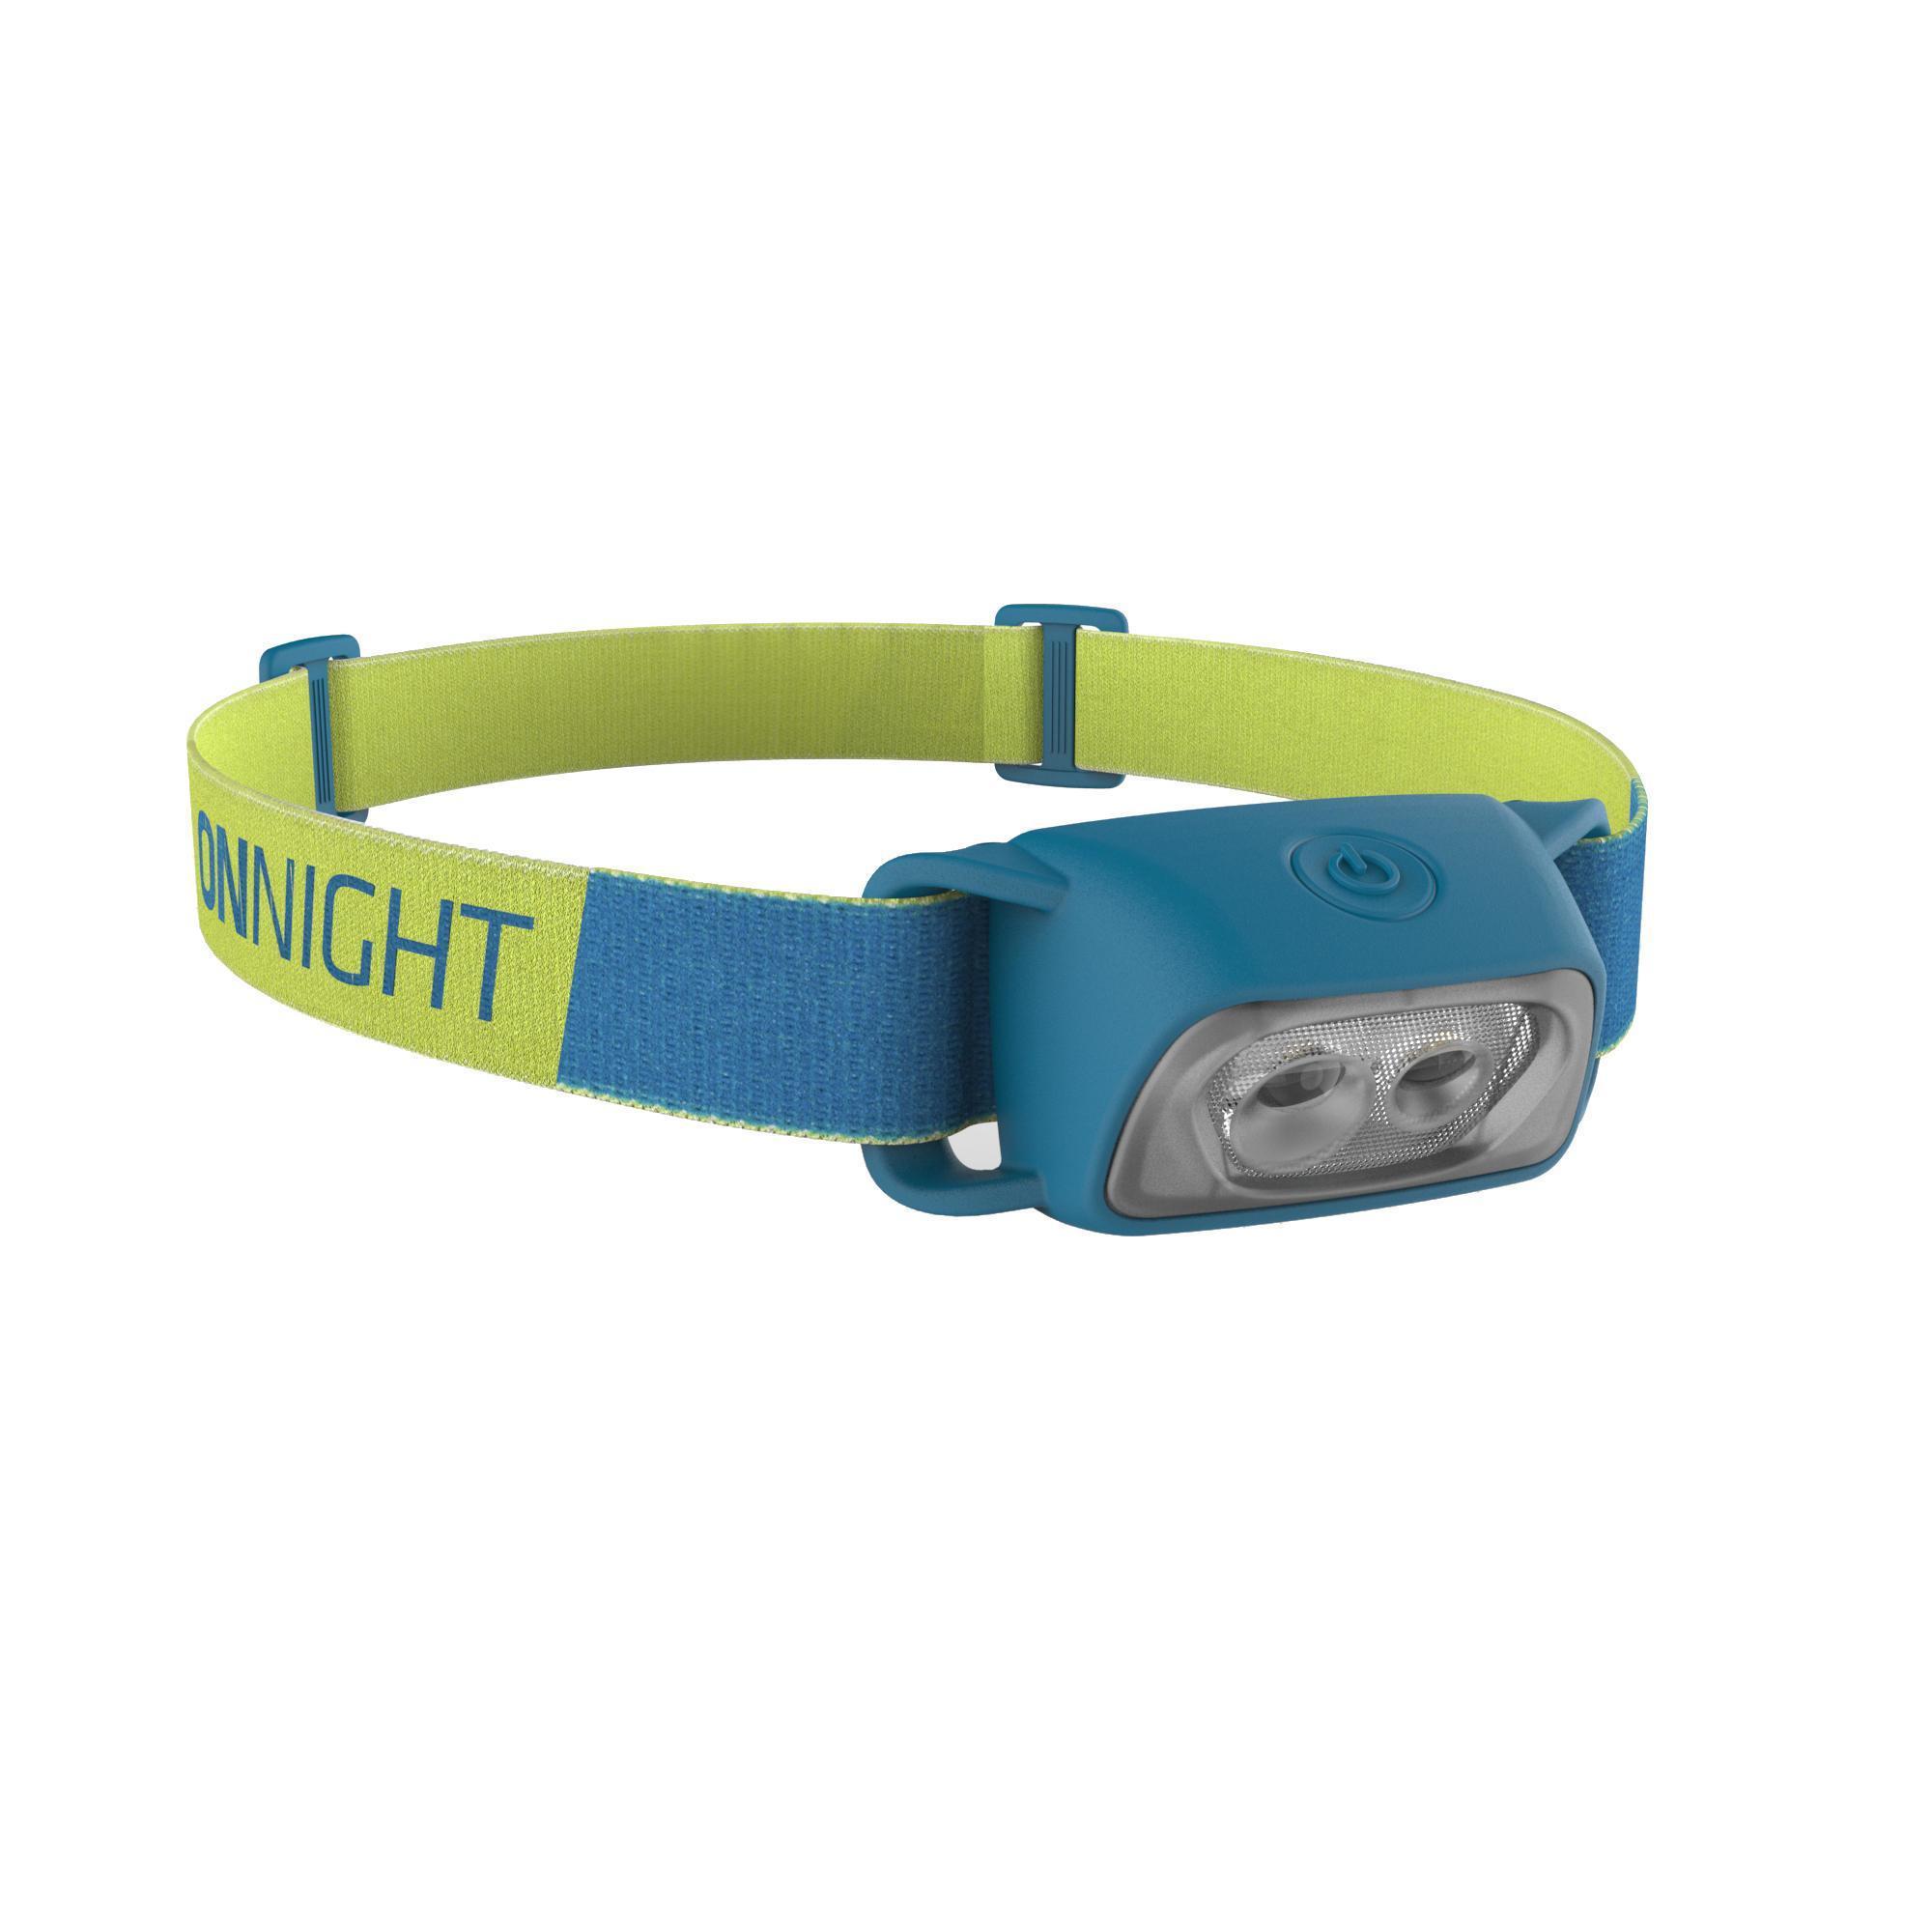 Lampe frontale trekking ONNIGHT 100 bleue - 80 lumens - Forclaz